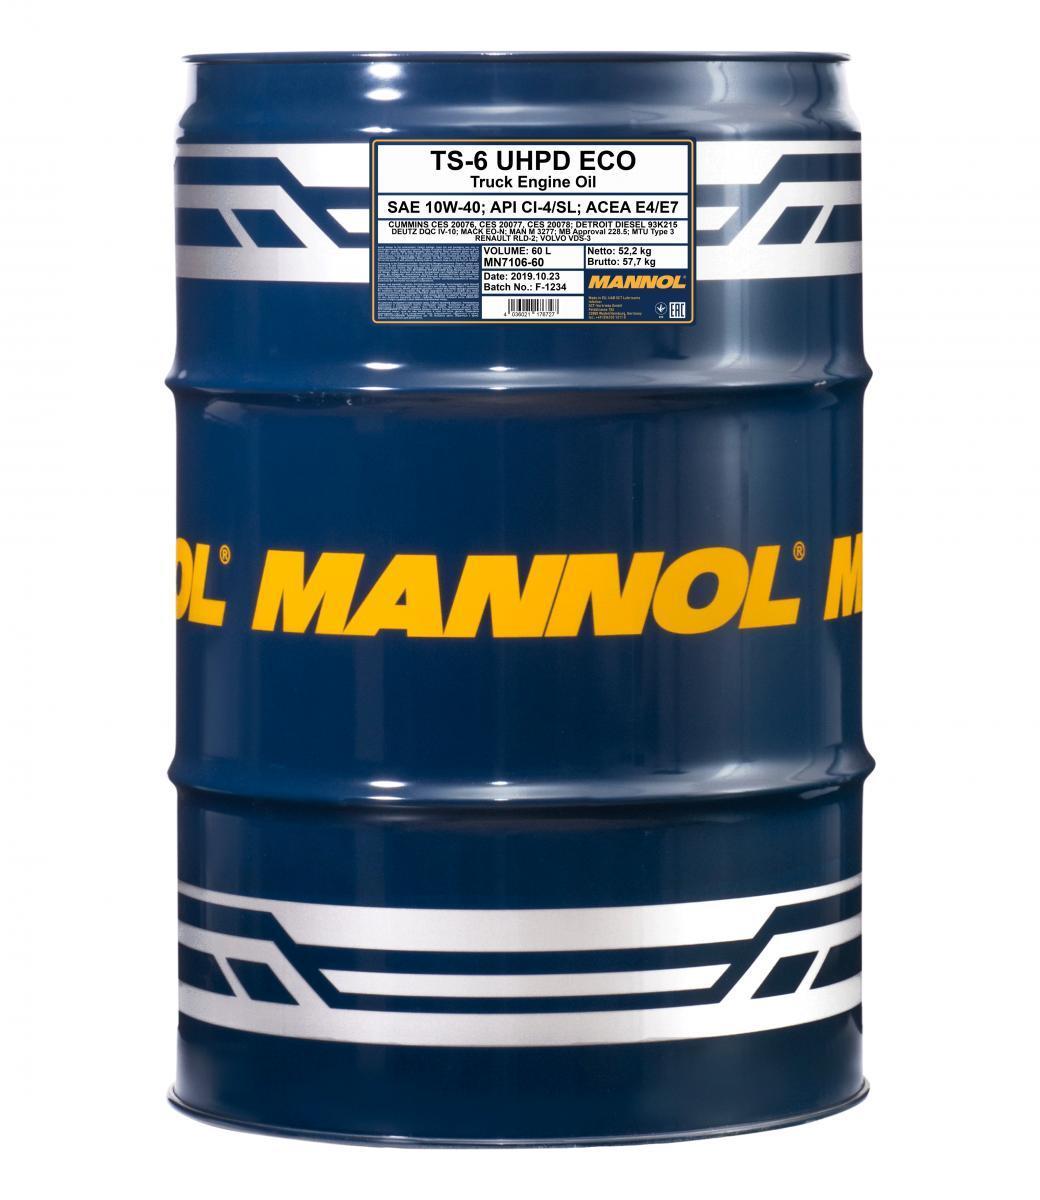 MN7106-60 MANNOL TS-6, UHPD Eco 10W-40, 10W-40, 60l Motoröl MN7106-60 günstig kaufen